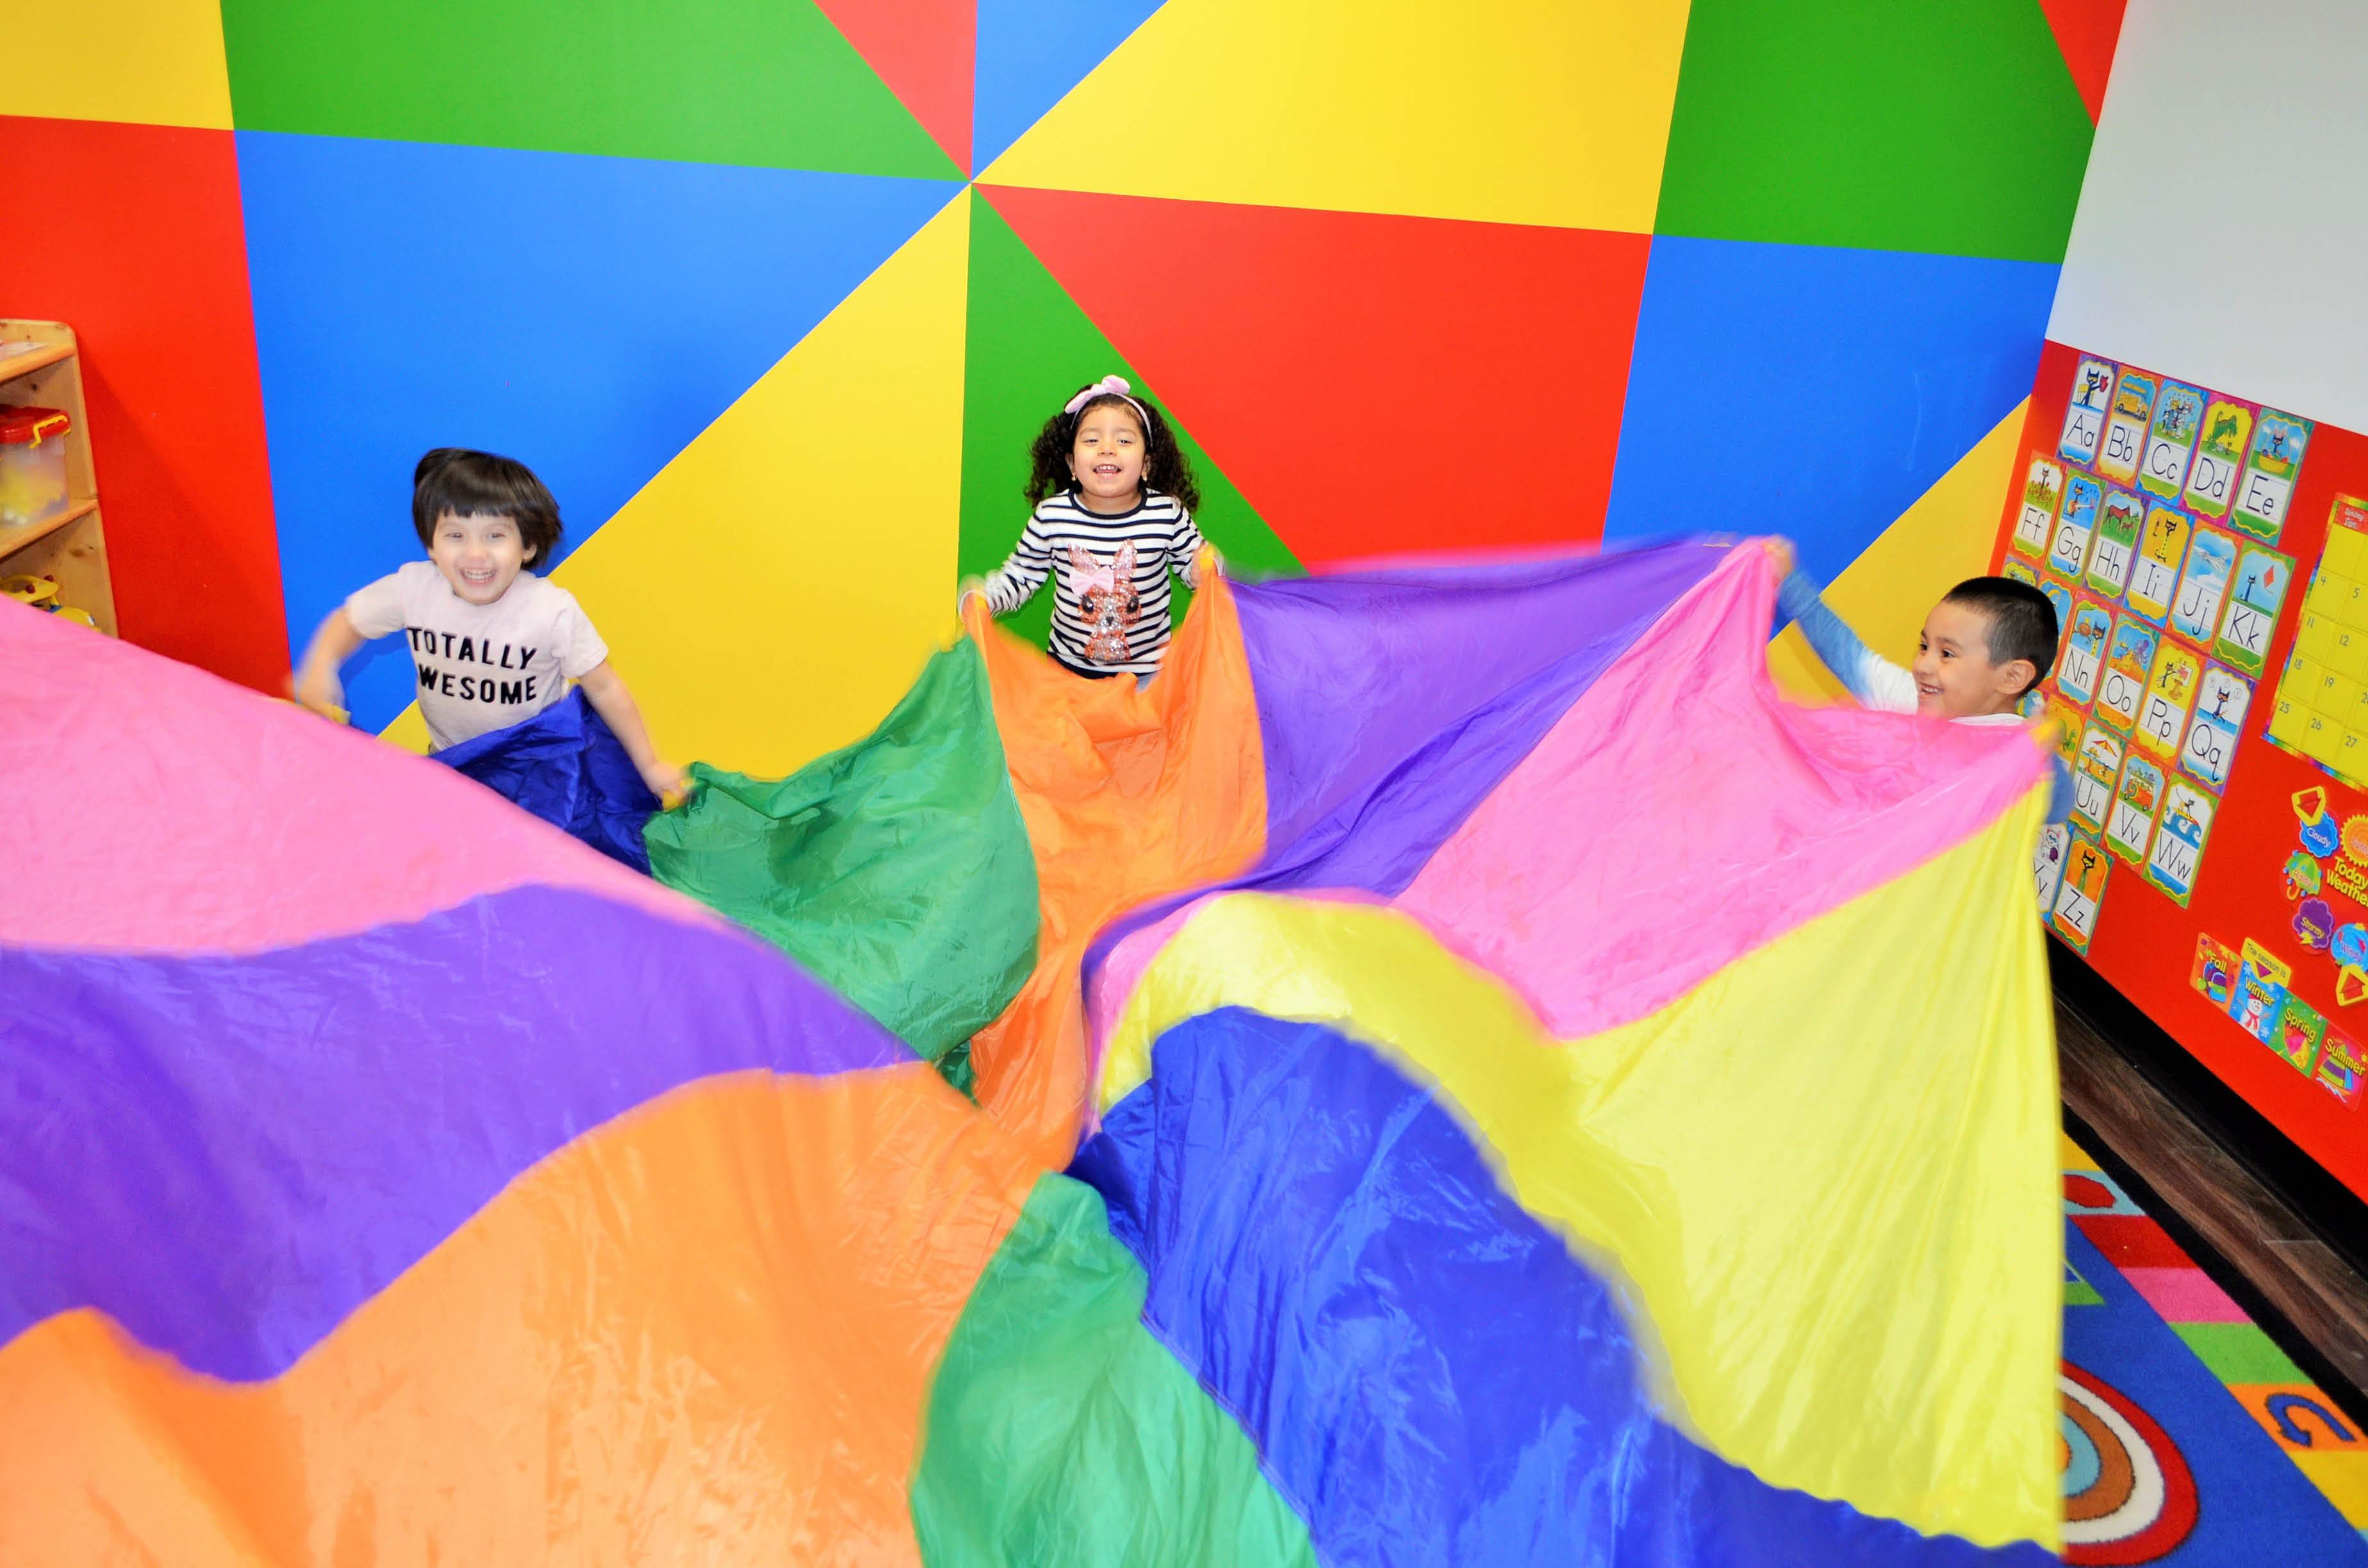 Kids playing on a rainbow parachute.